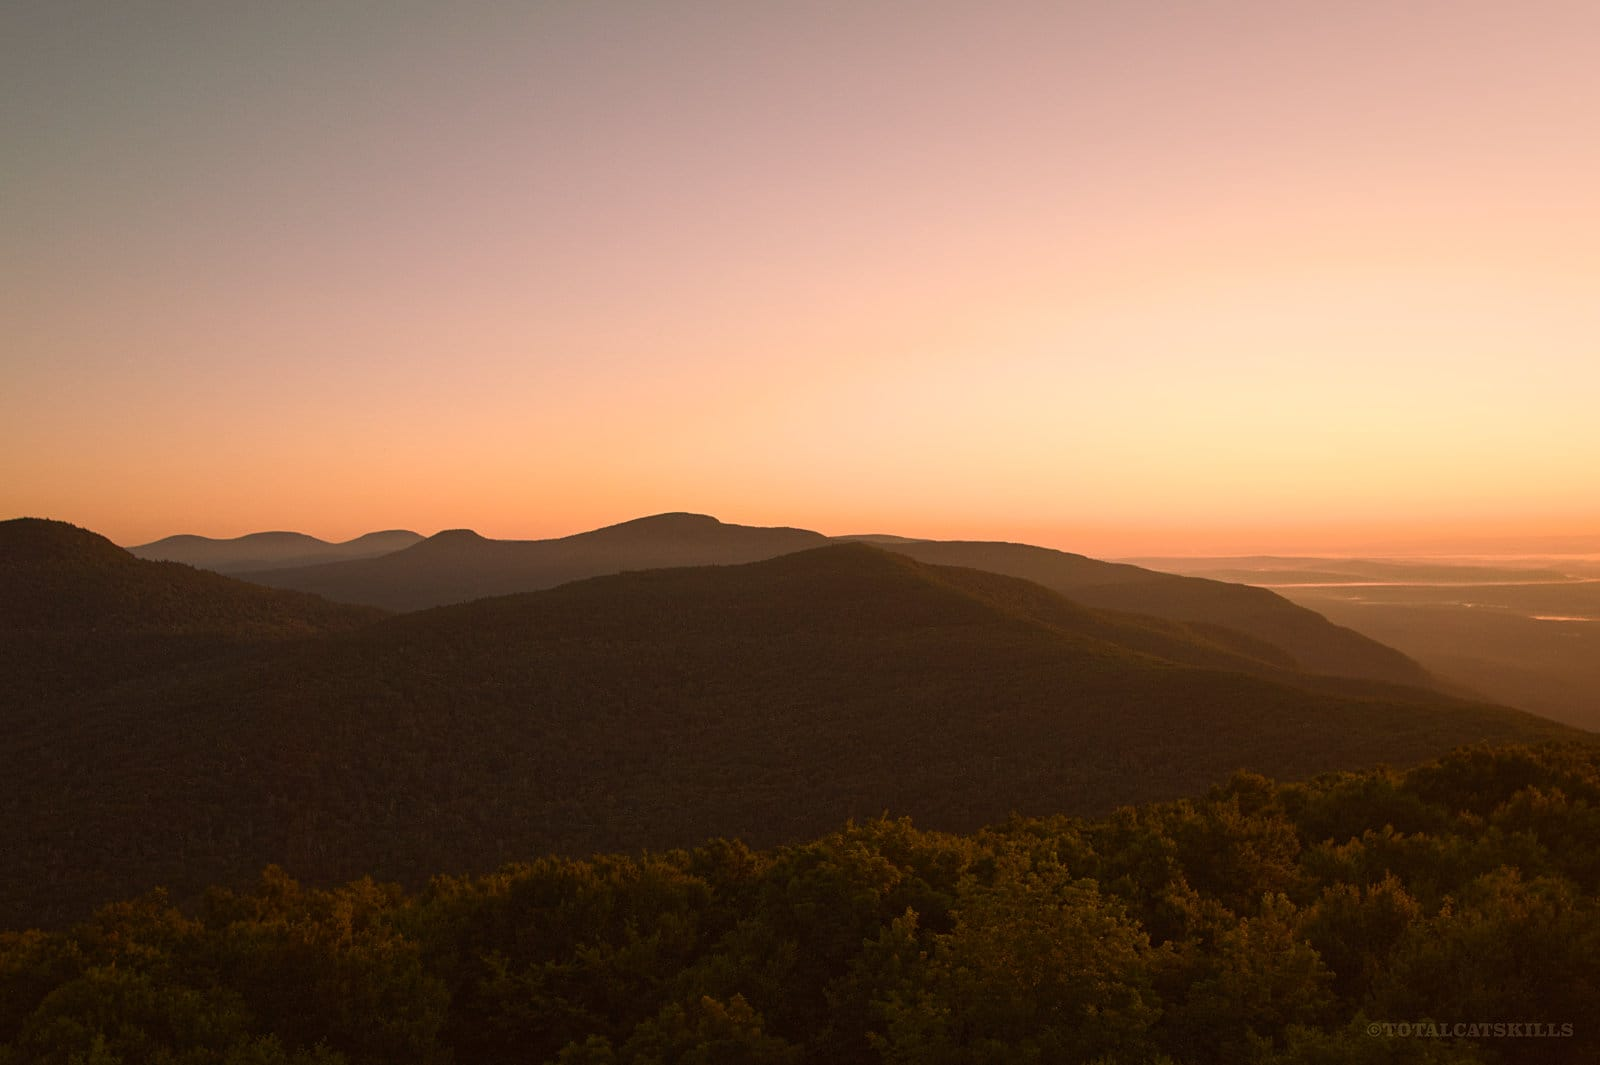 pre-dawn mountain ridges